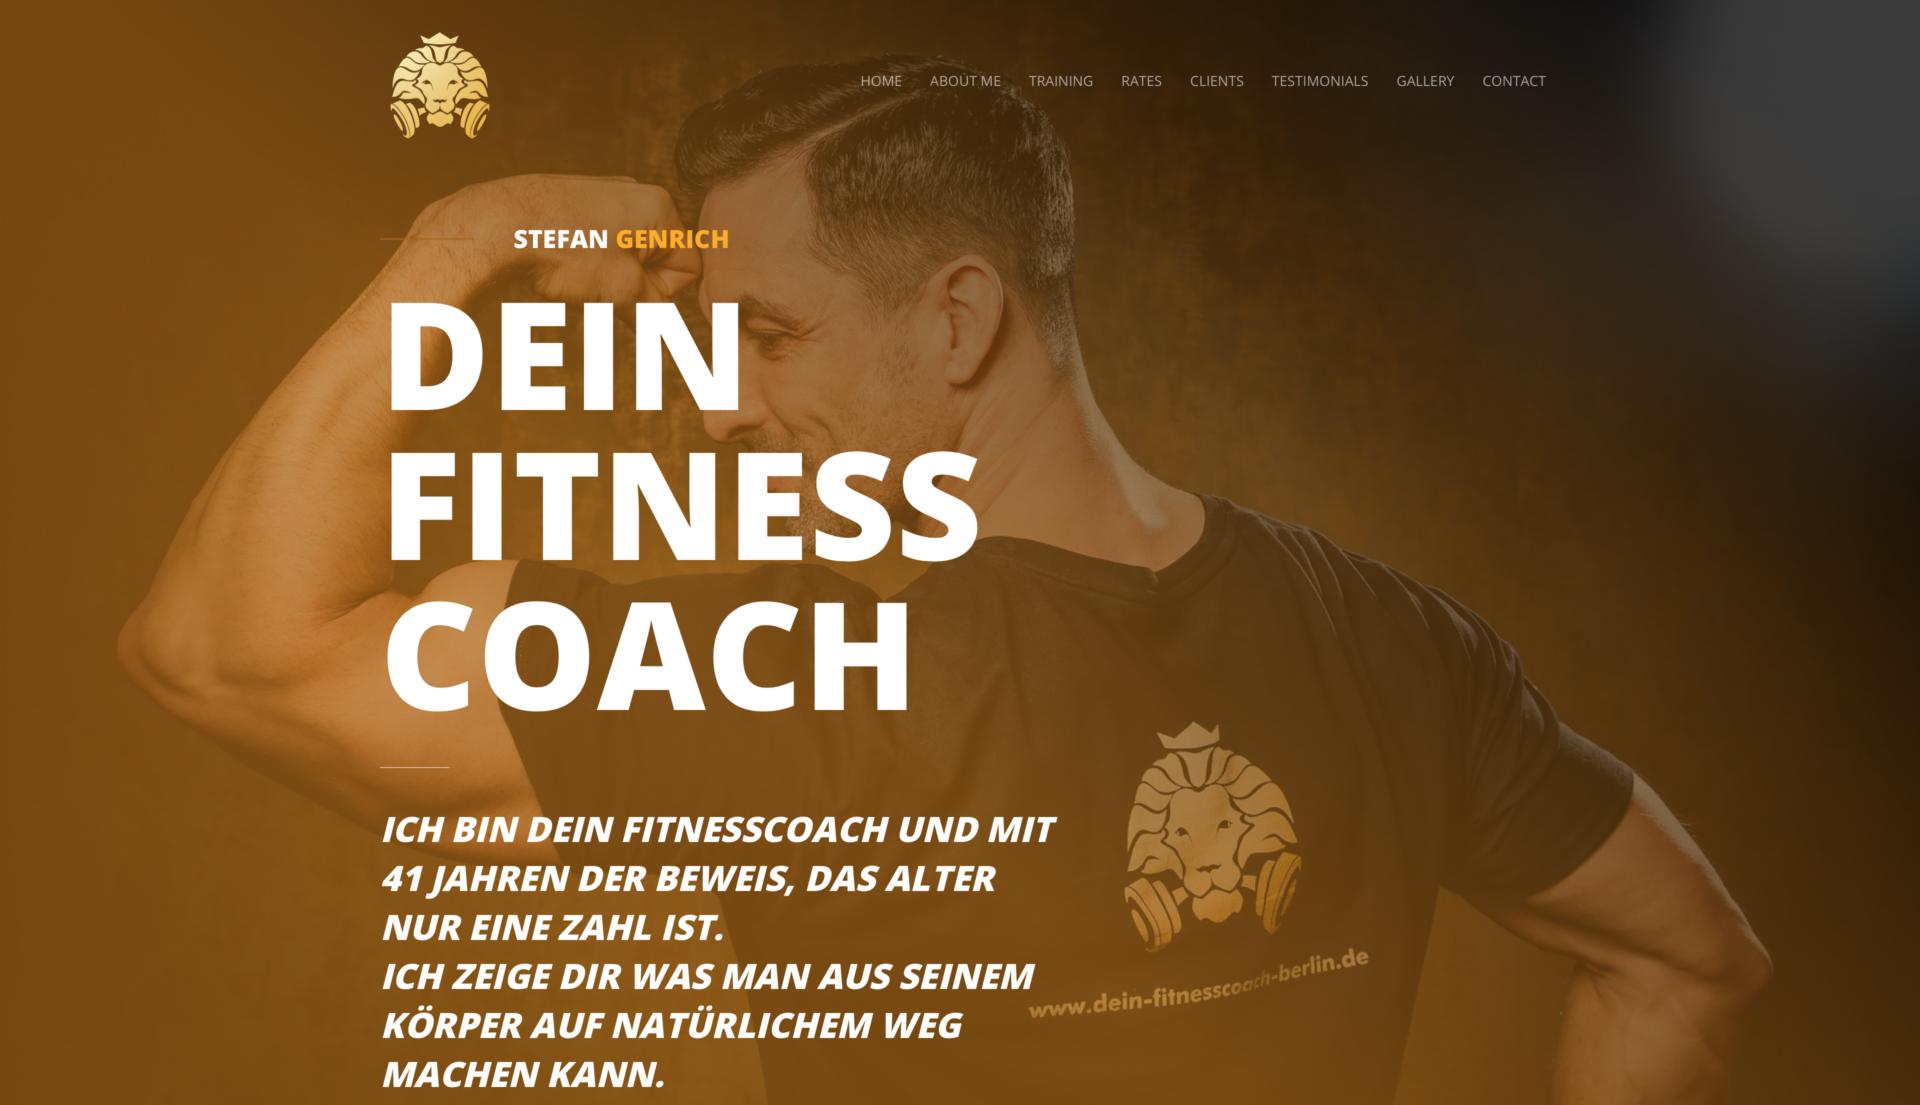 dein-fitnesscoach-berlin.de